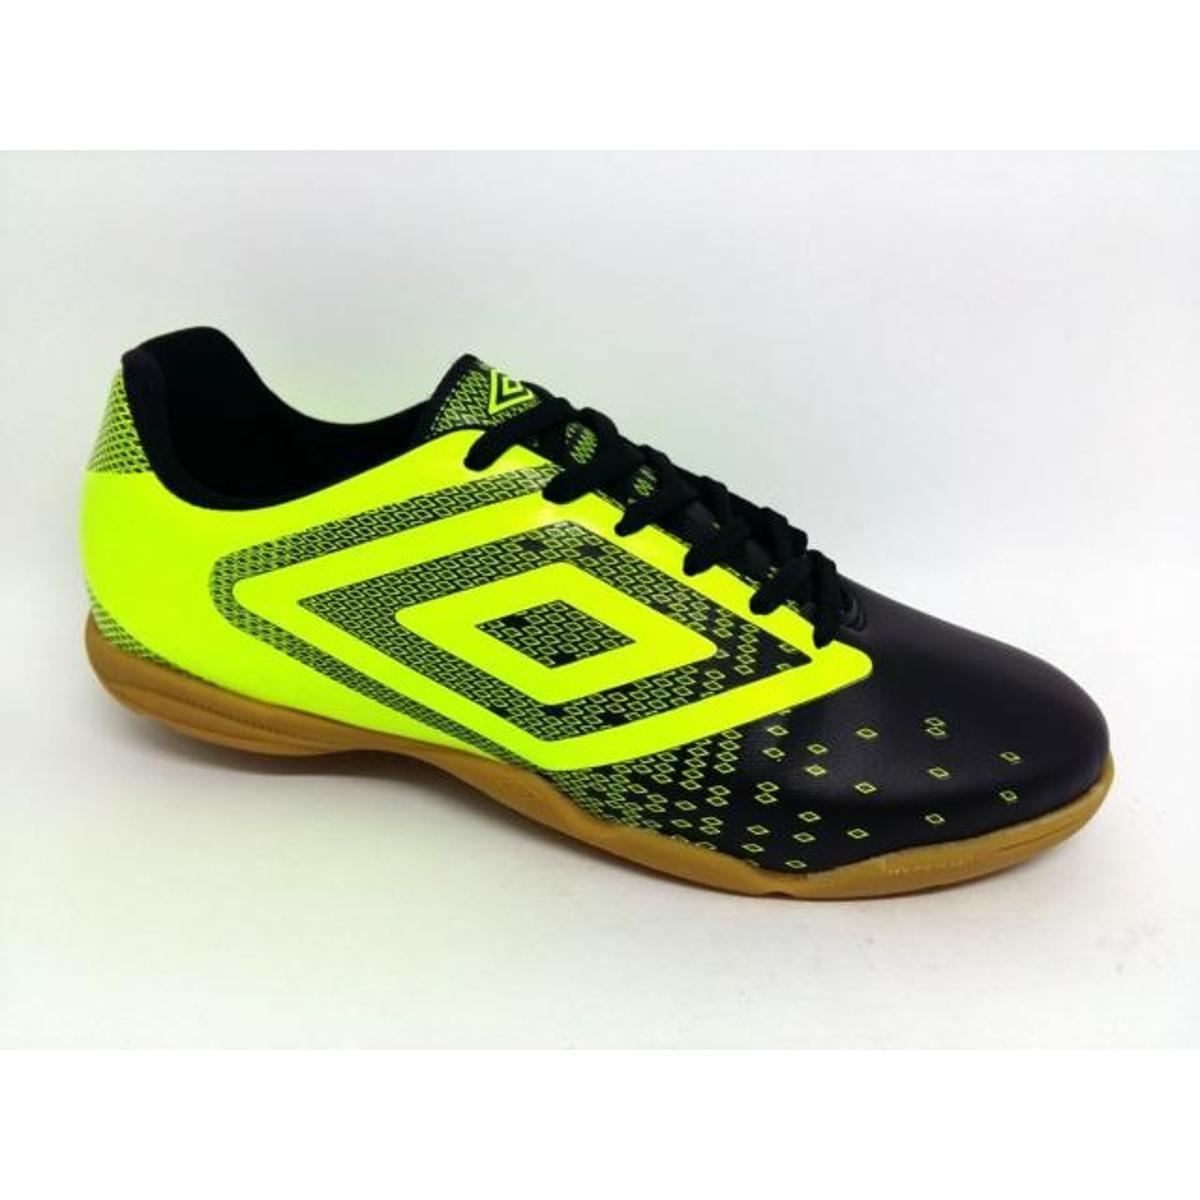 39e5660ca6edf Chuteira Futsal Umbro Flux Masculina - Preto e Amarelo - Compre Agora